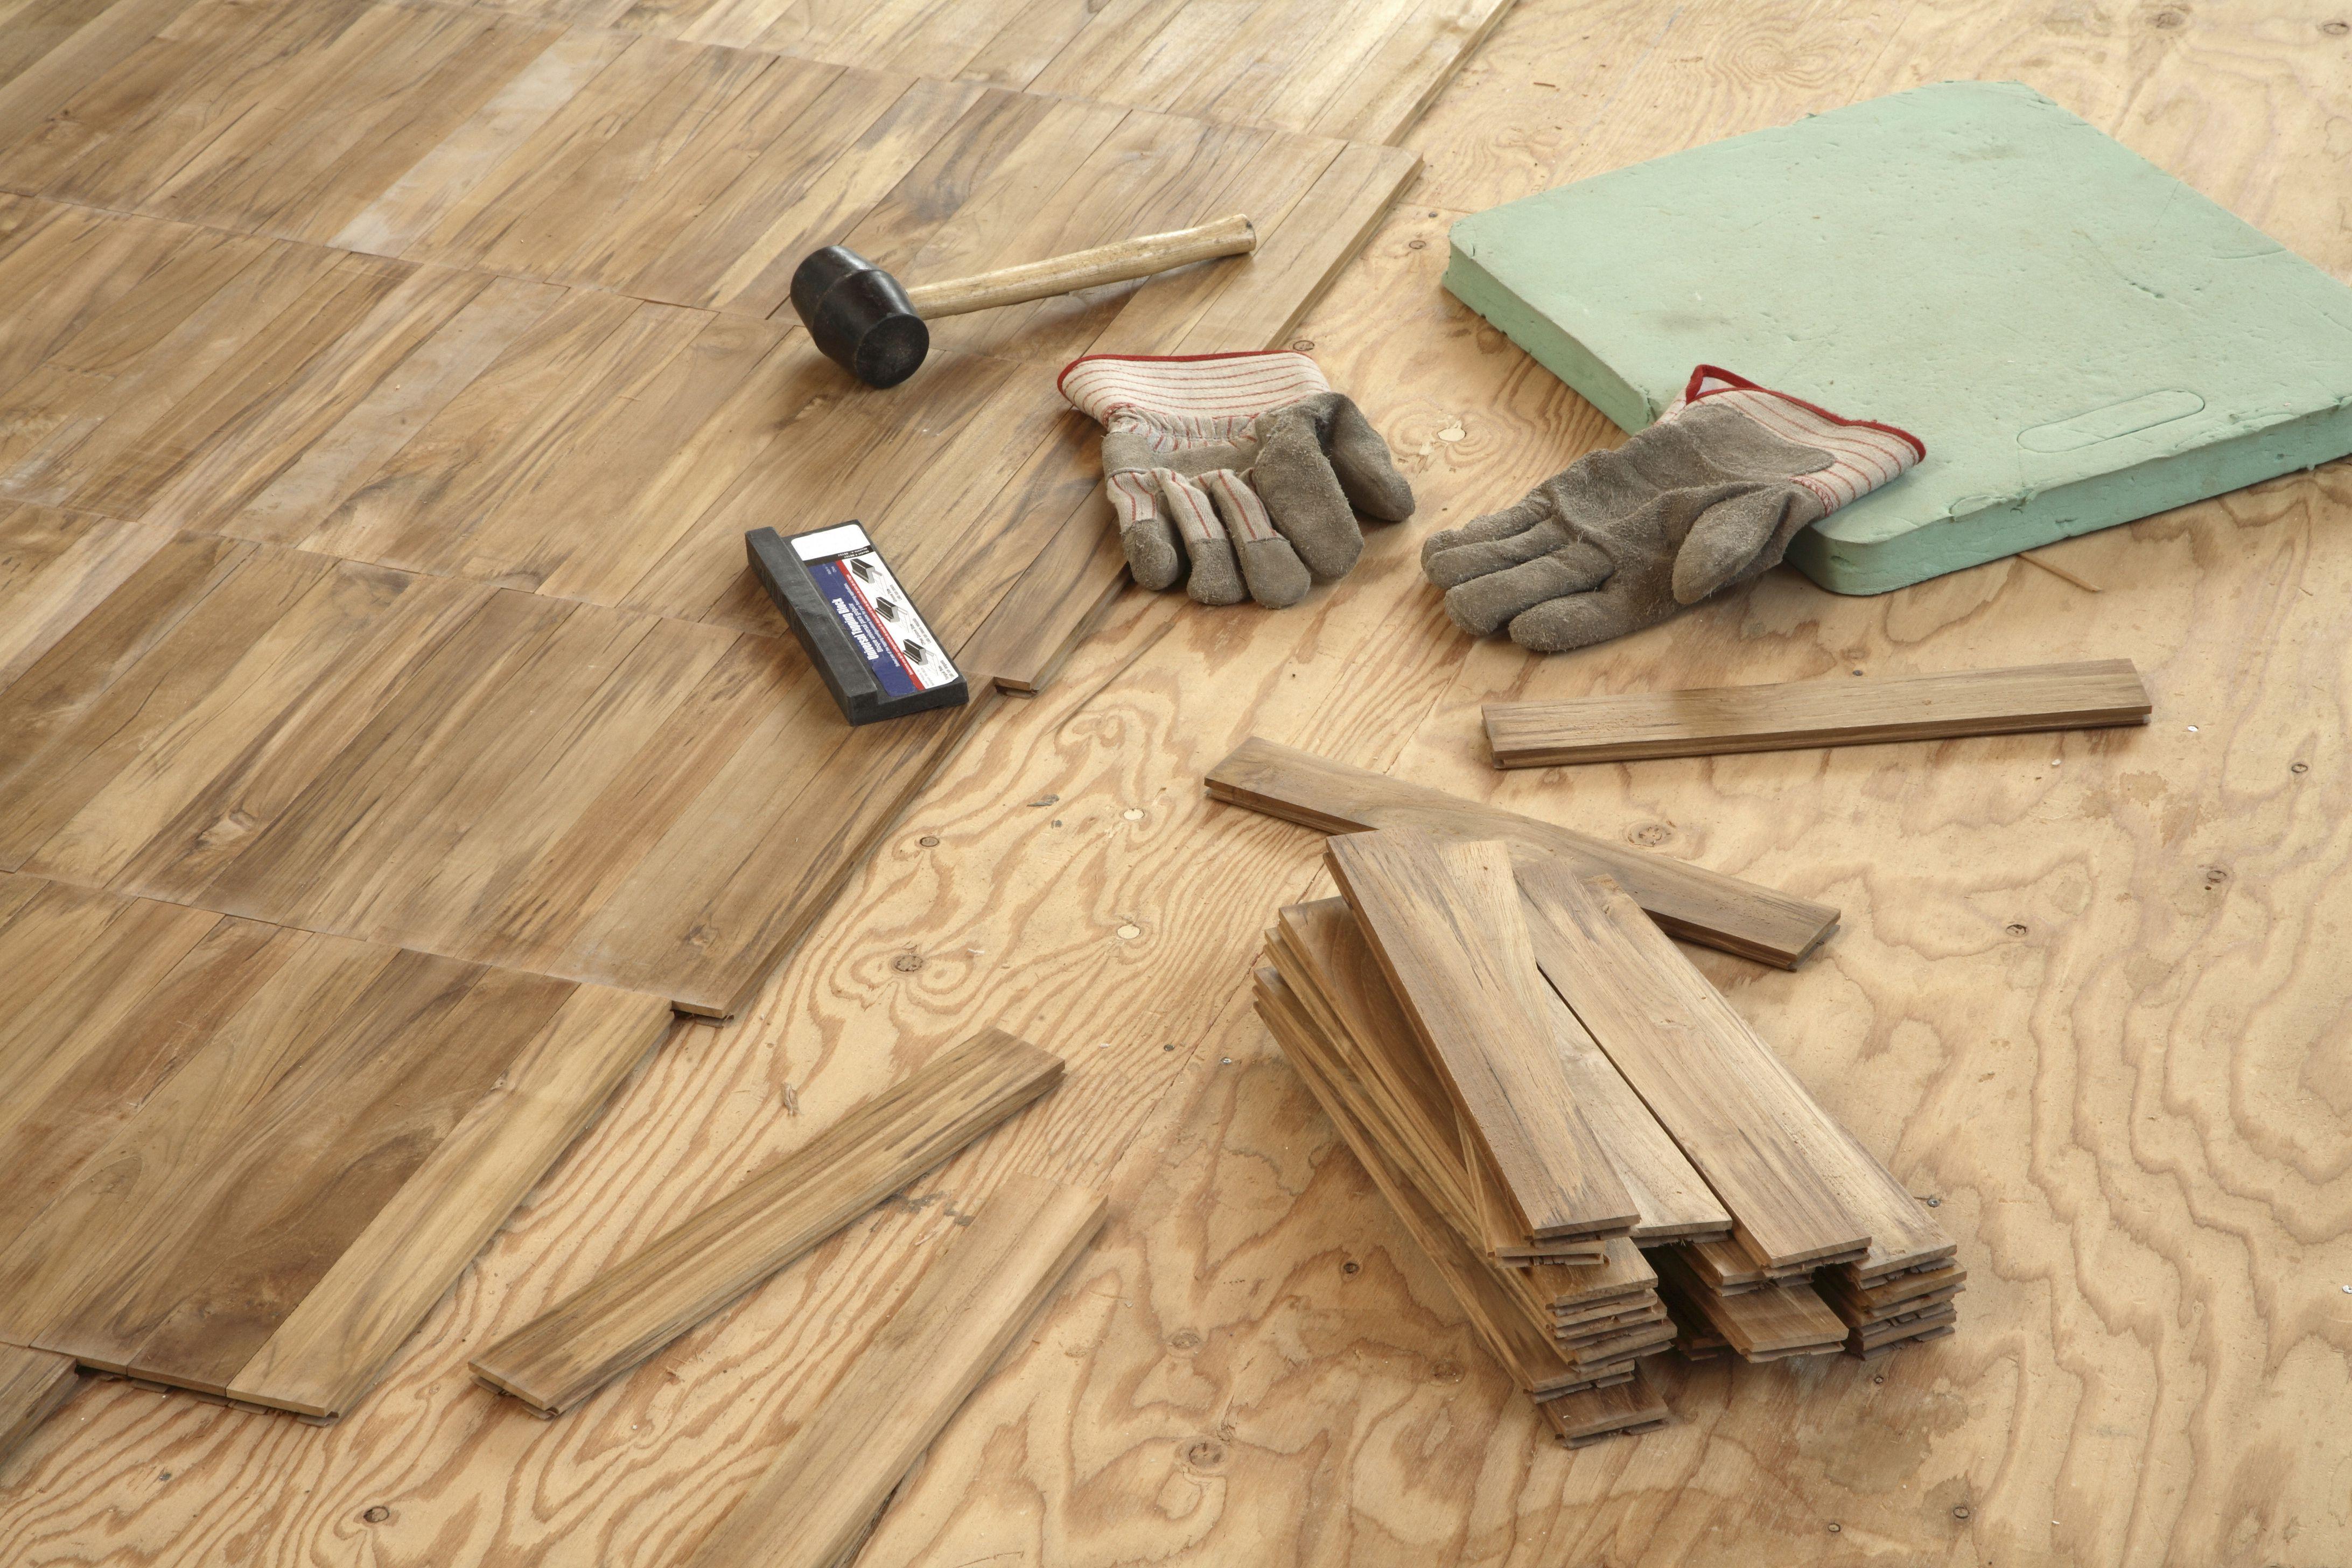 hardwood floor sealer home depot of plywood underlayment pros and cons types and brands pertaining to plywoodunderlaymentunderwoodflooring 5ac24fbcae9ab8003781af25